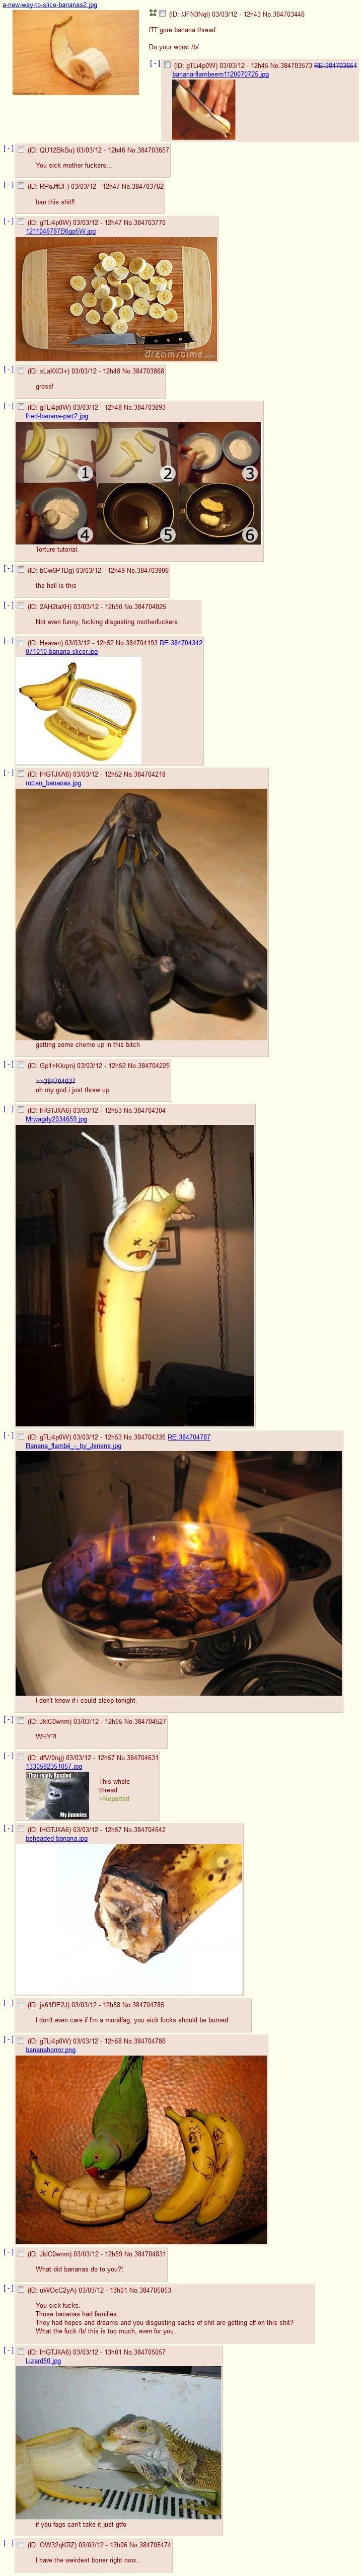 banana-gore thread. bana- gore thread. D an // 03/ No 304703446 W gore banana thread Do your wens! /07 H D an ) 03703/ 12 - 12045 No 304703573 wmm H D an ) 0370 banana-gore thread bana- gore D an // 03/ No 304703446 W banana Do your wens! /07 H ) 03703/ 12 - 12045 304703573 wmm 0370